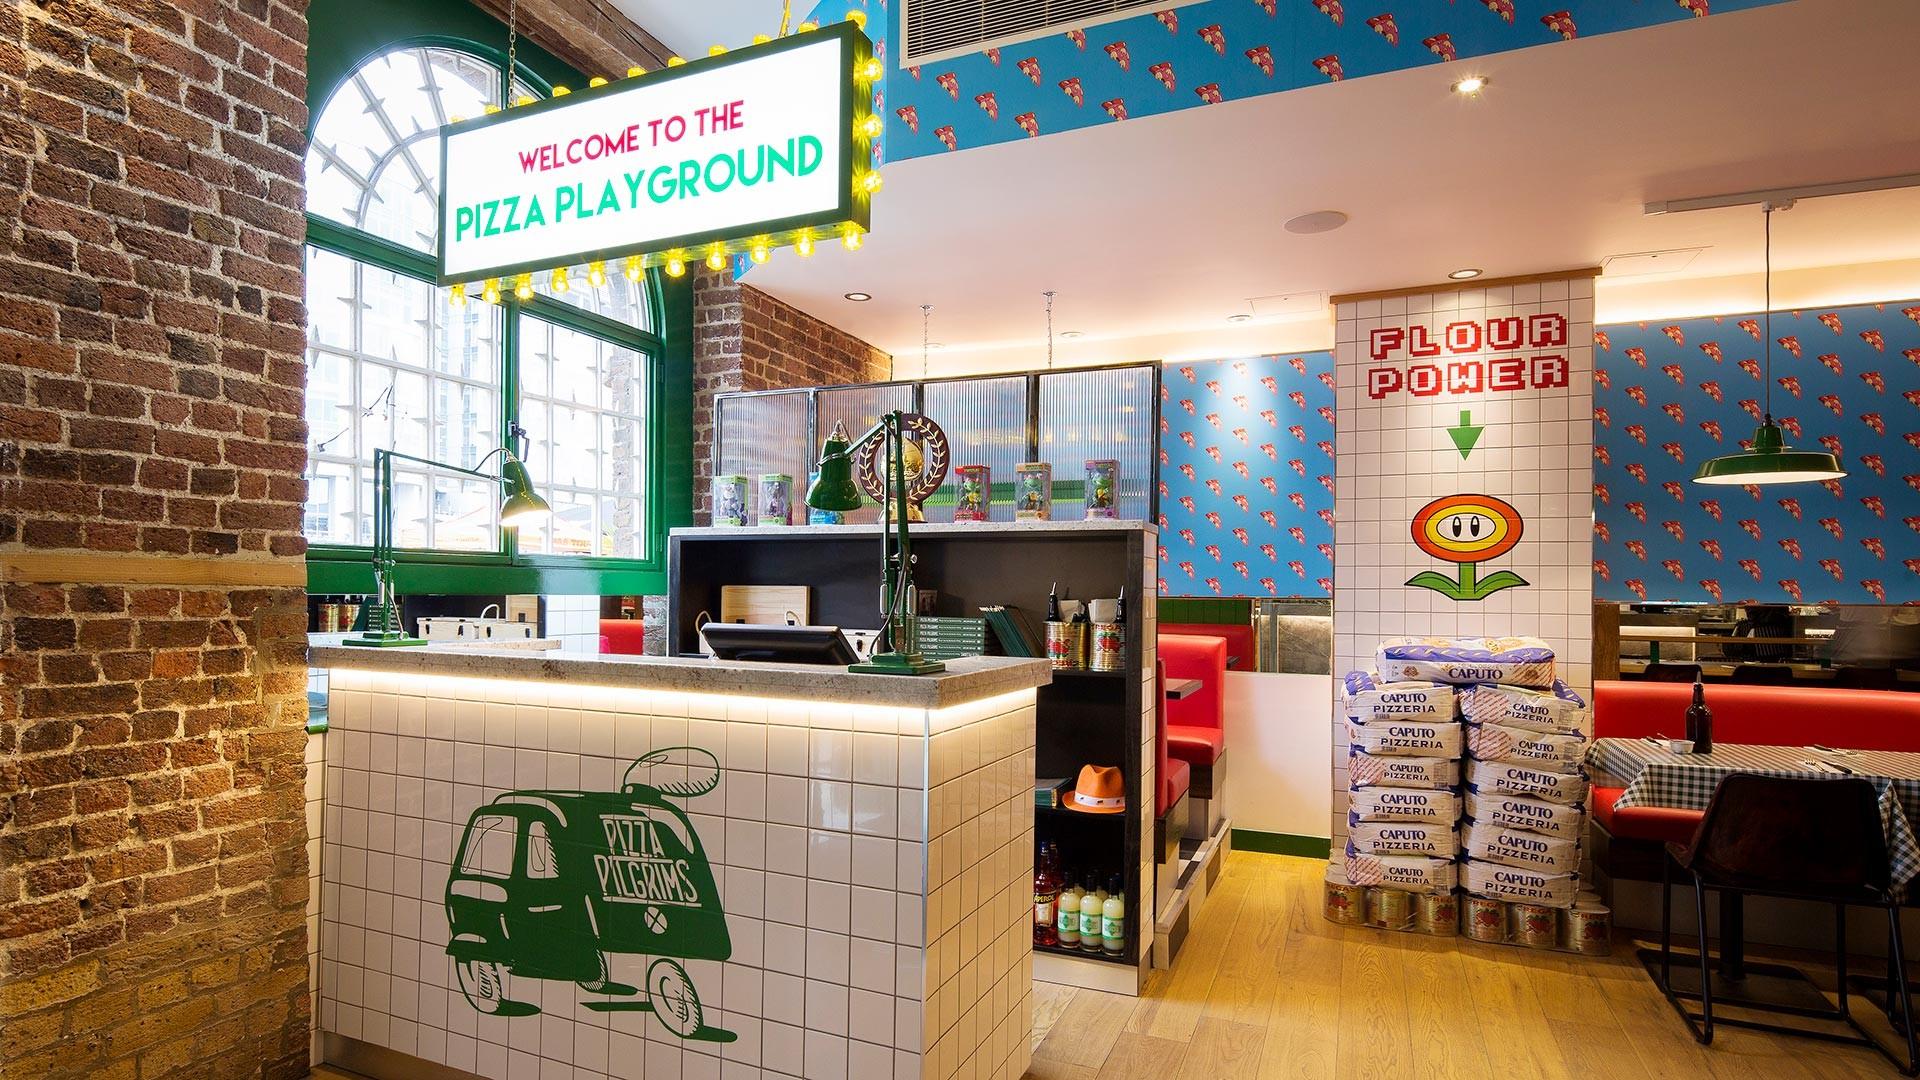 One of Pizza Pilgrims' London sites